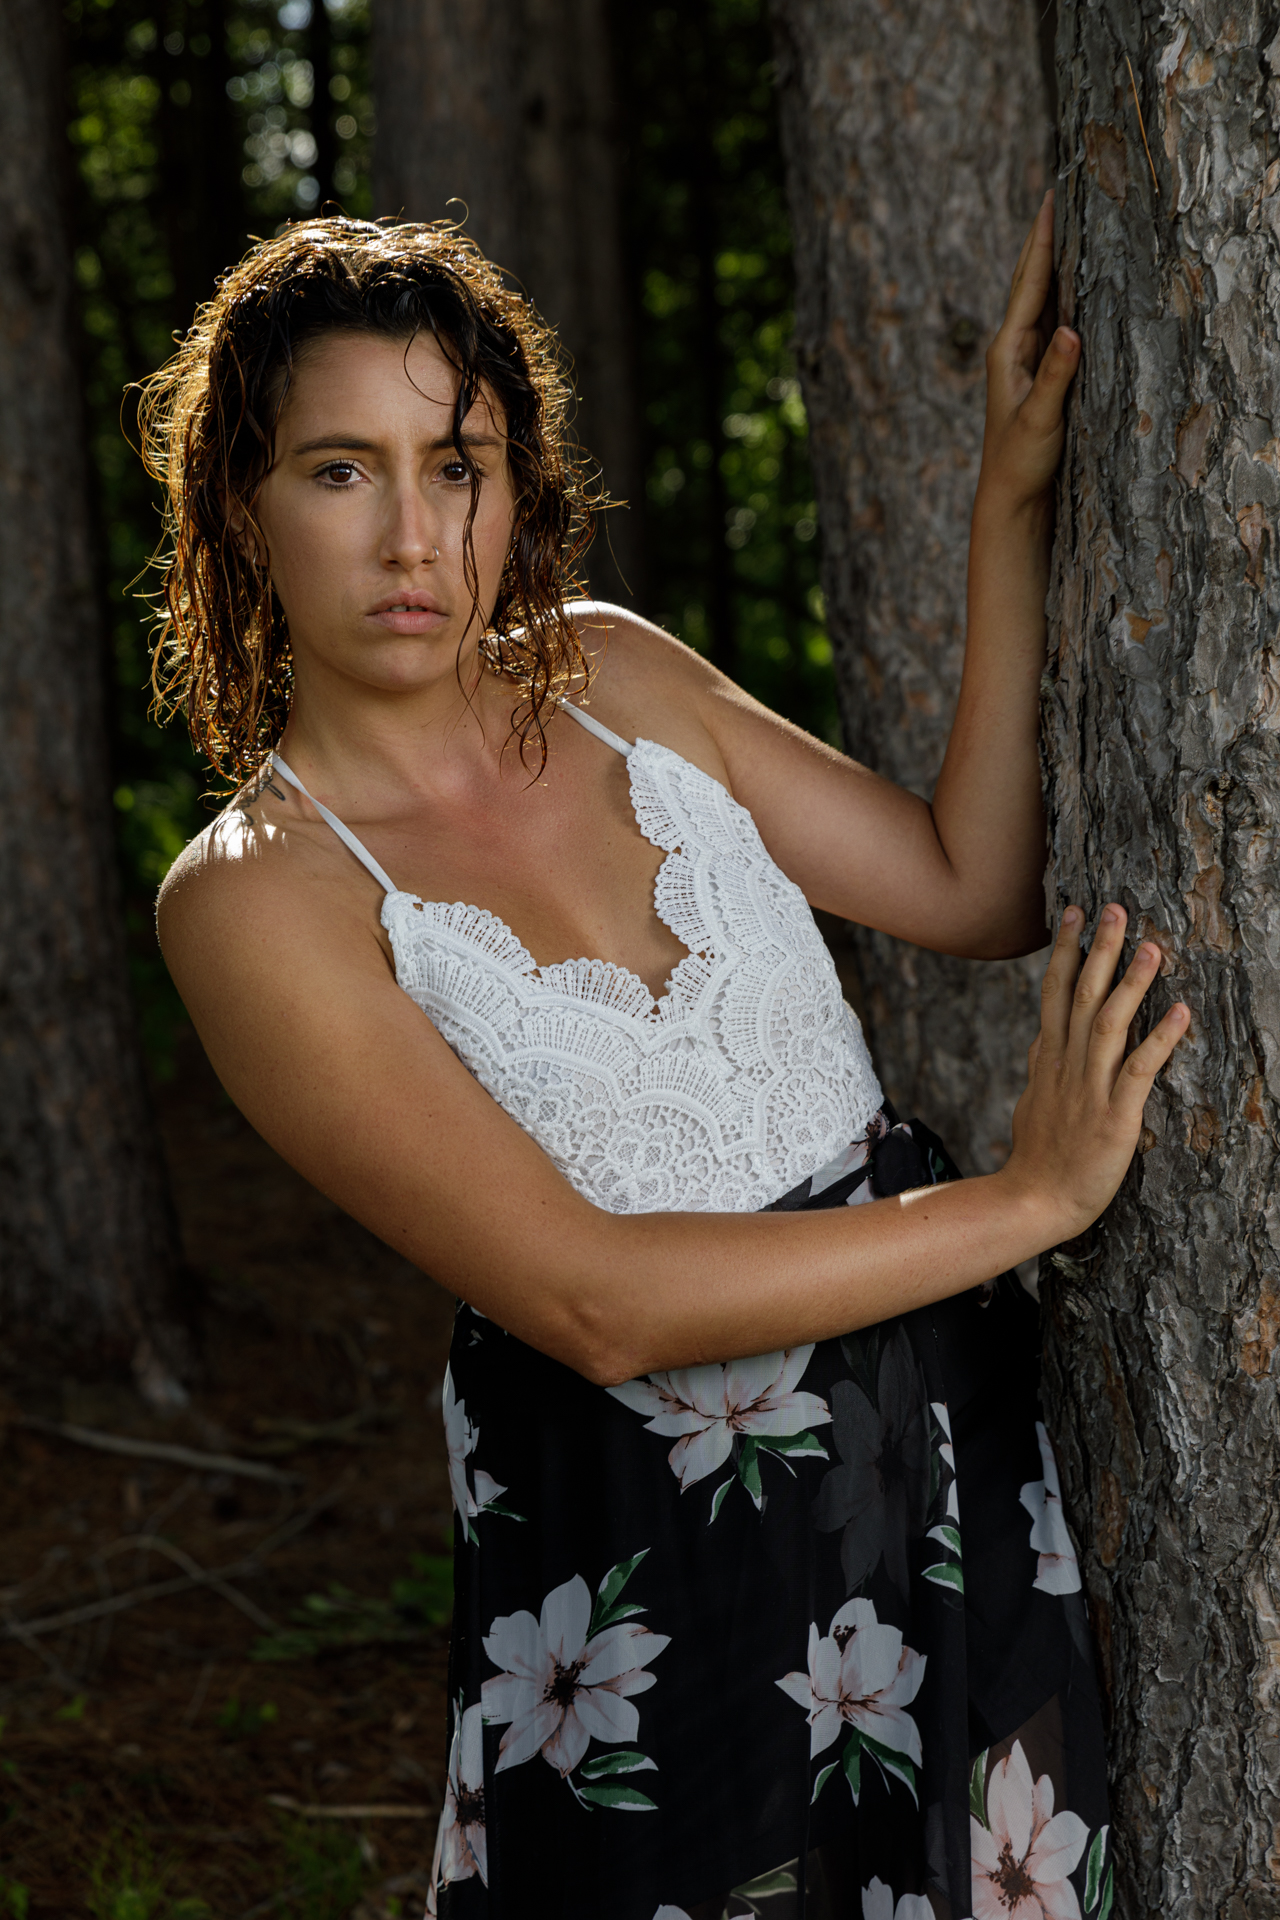 CFrenette-Vanessa-24